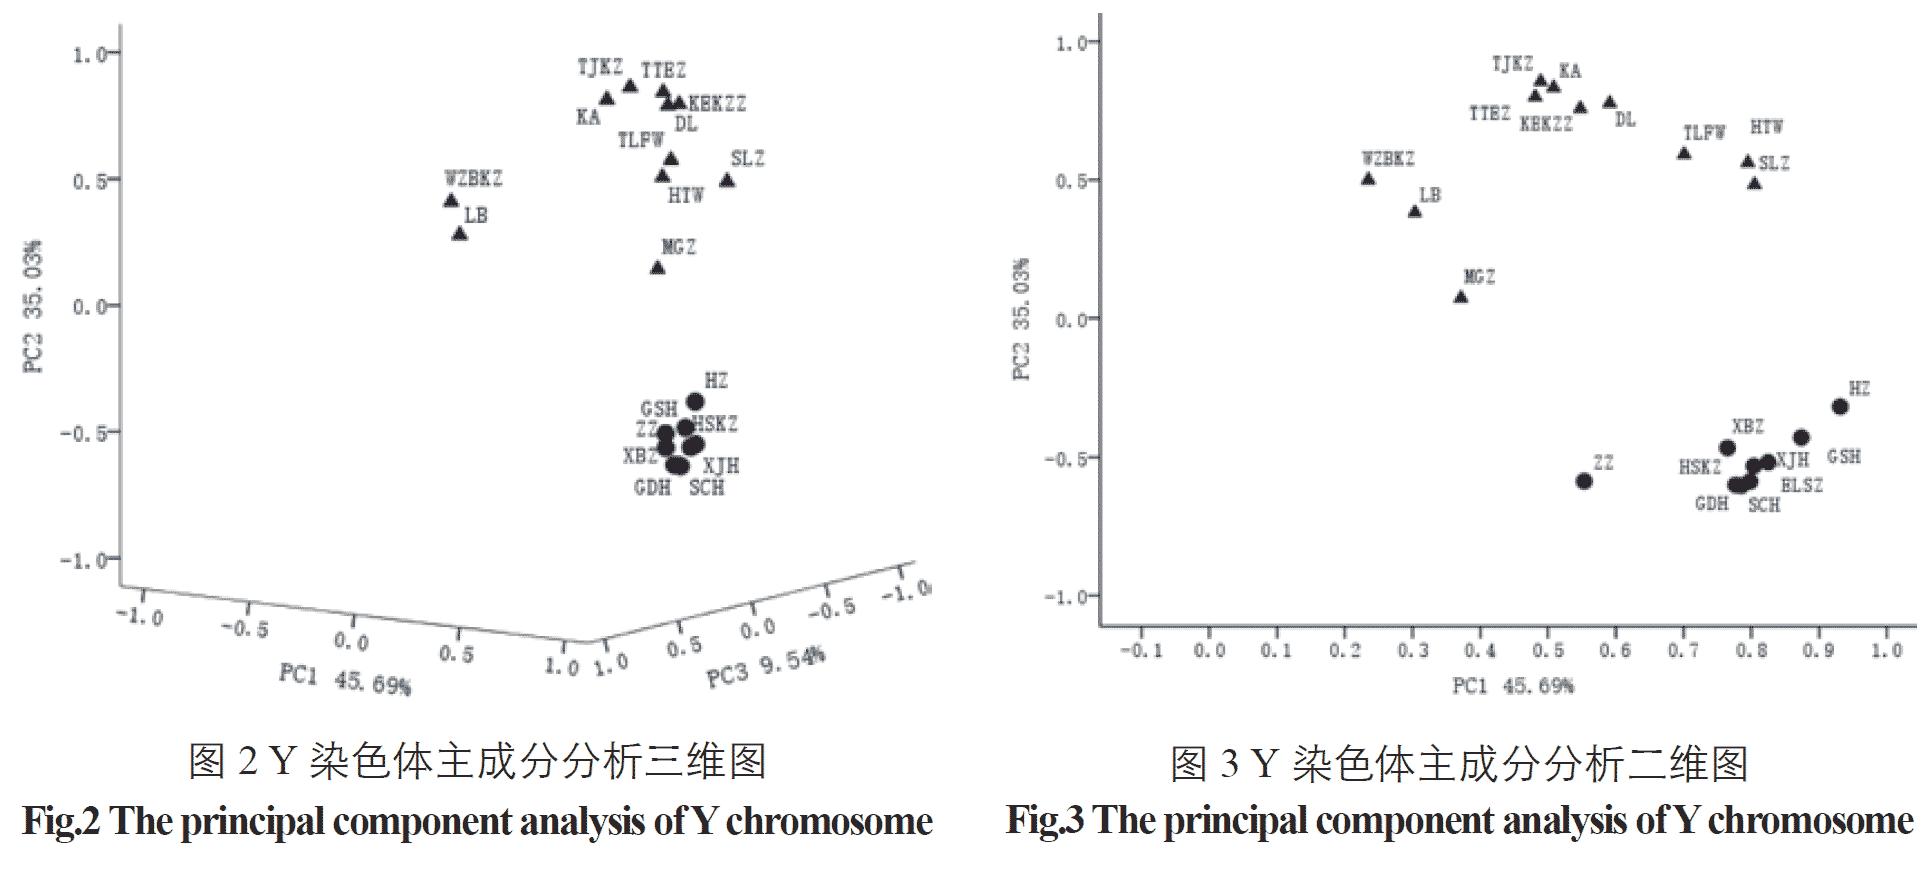 y-chromosome-pca